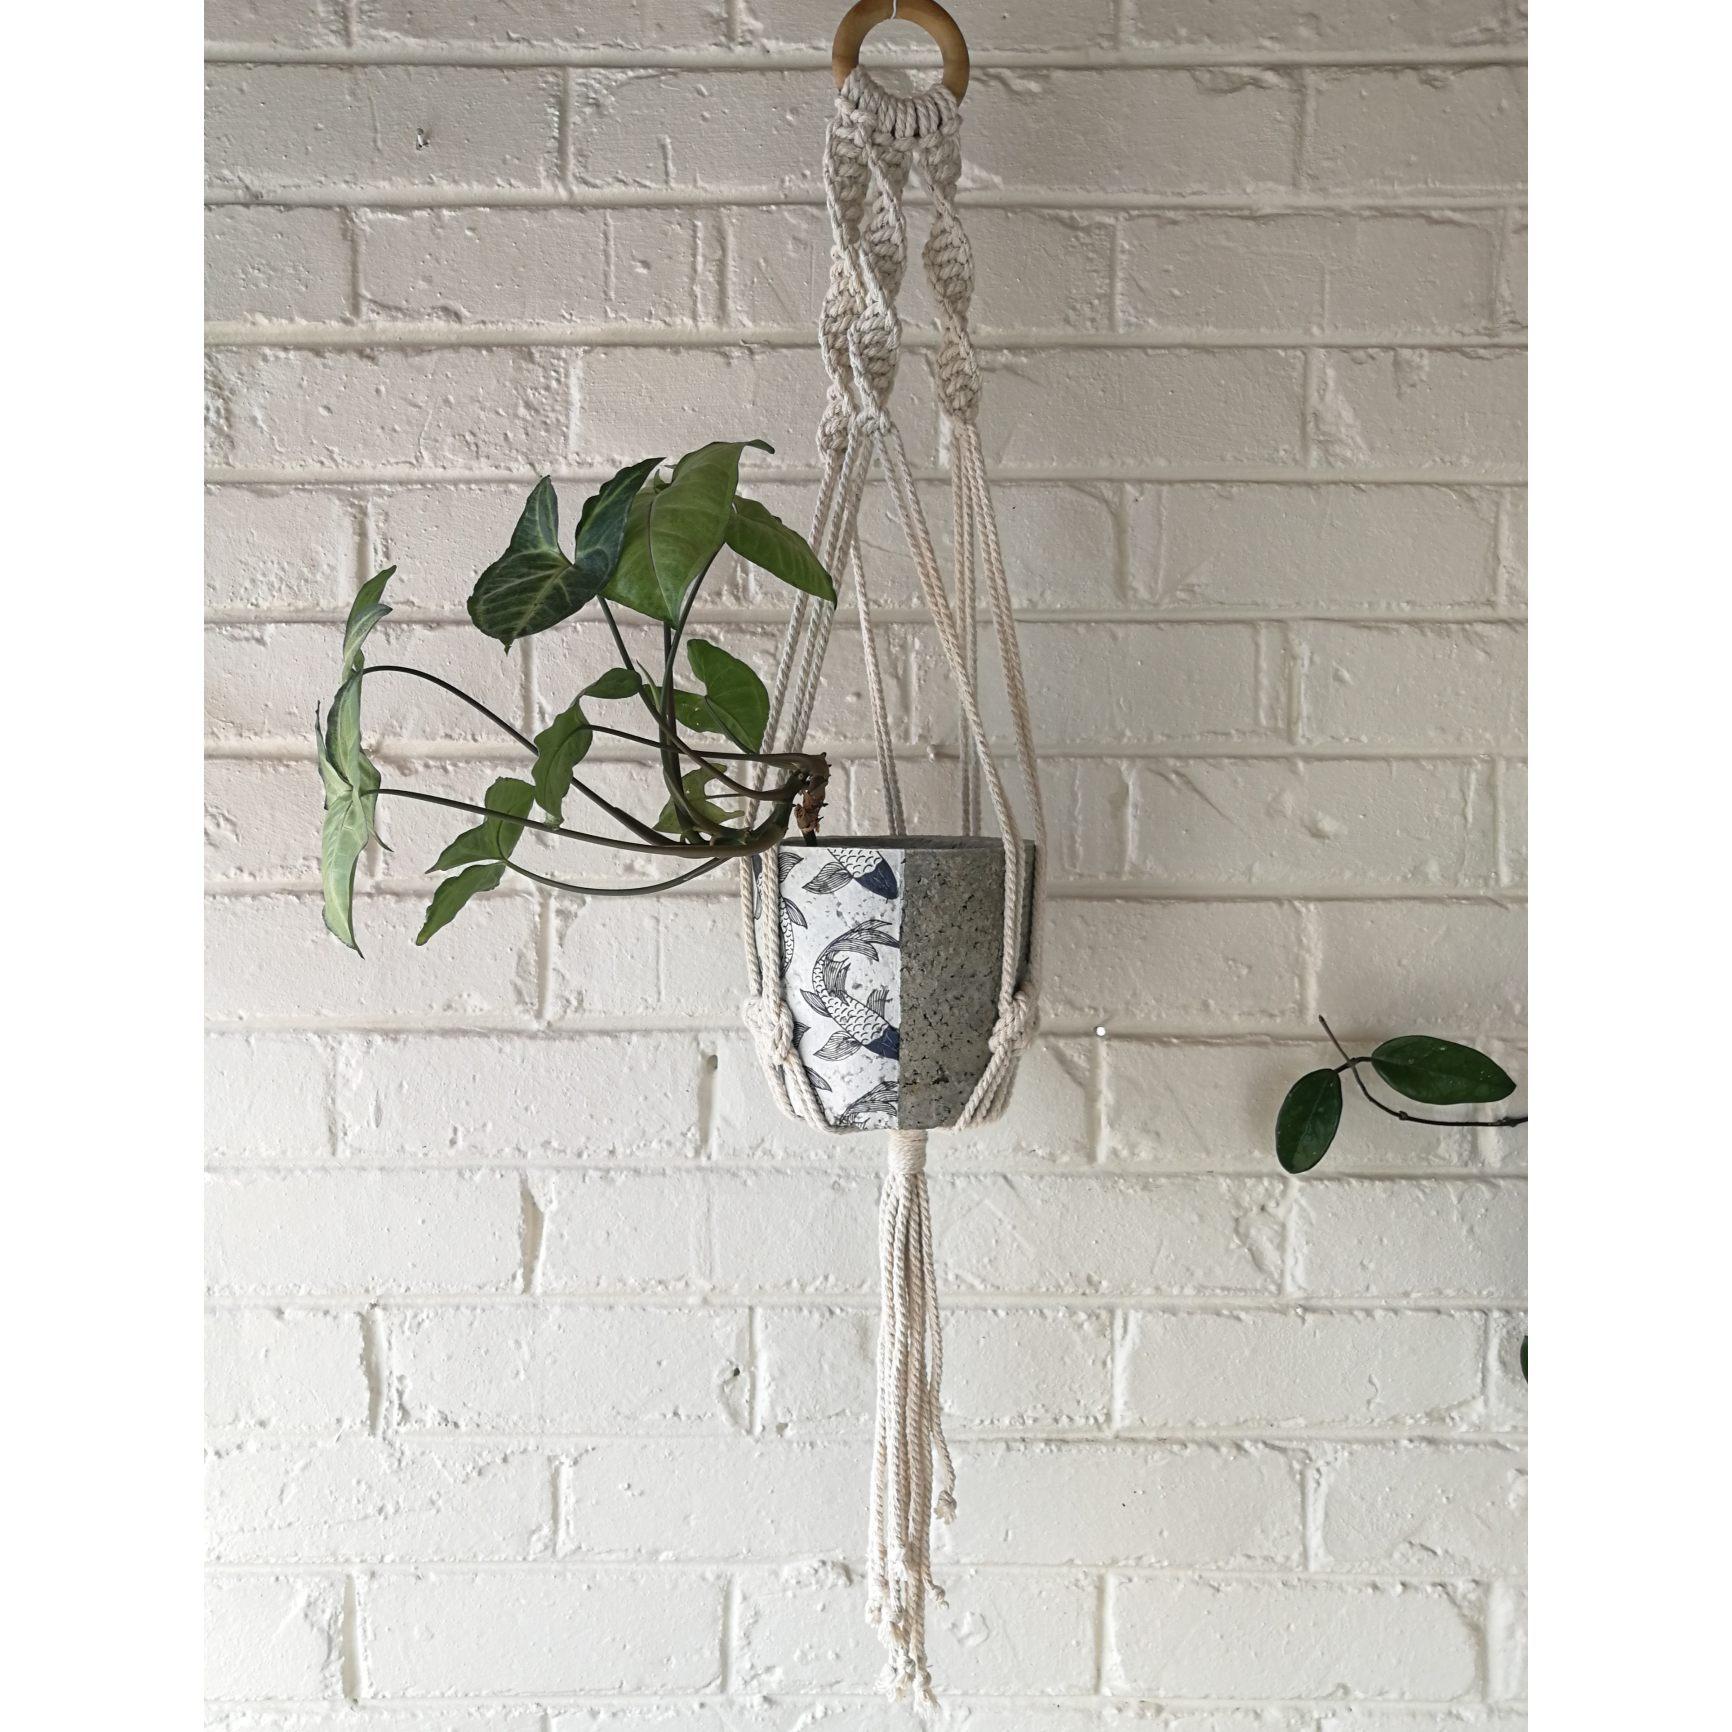 Macramé hanger with koi fish plant pot